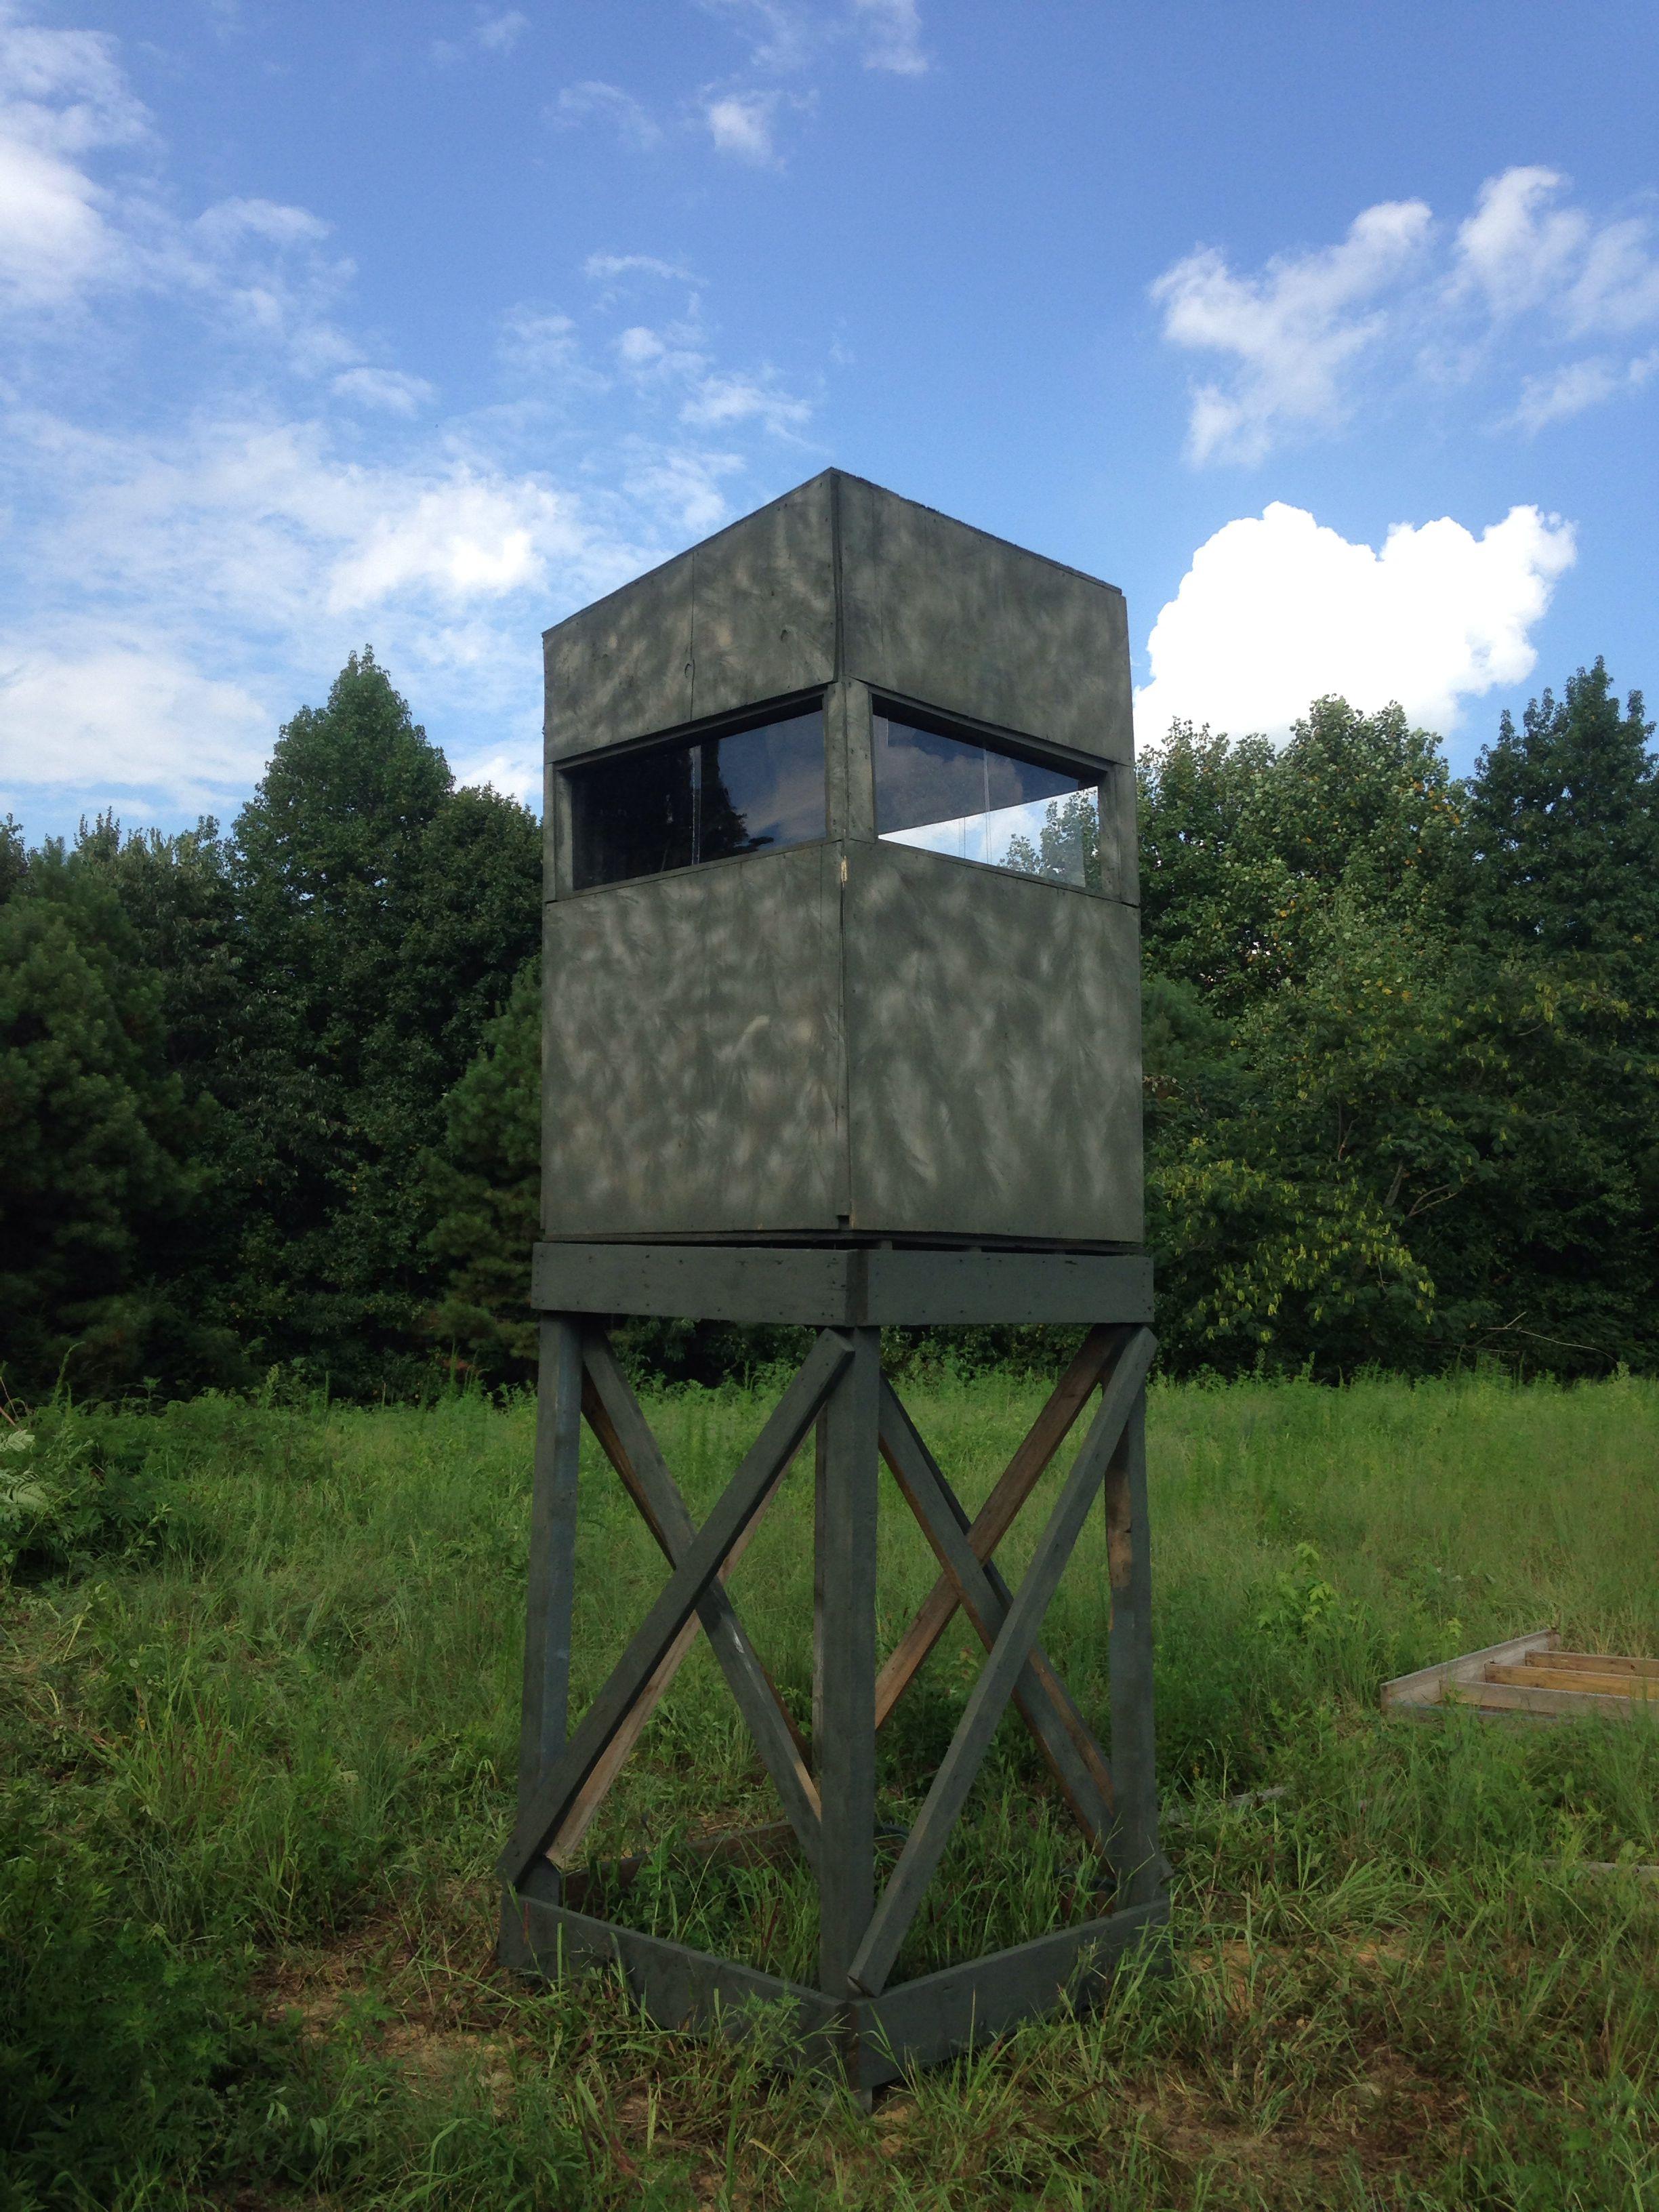 4x4 Shooting House With Sliding Plexiglass Windows Camouflaged